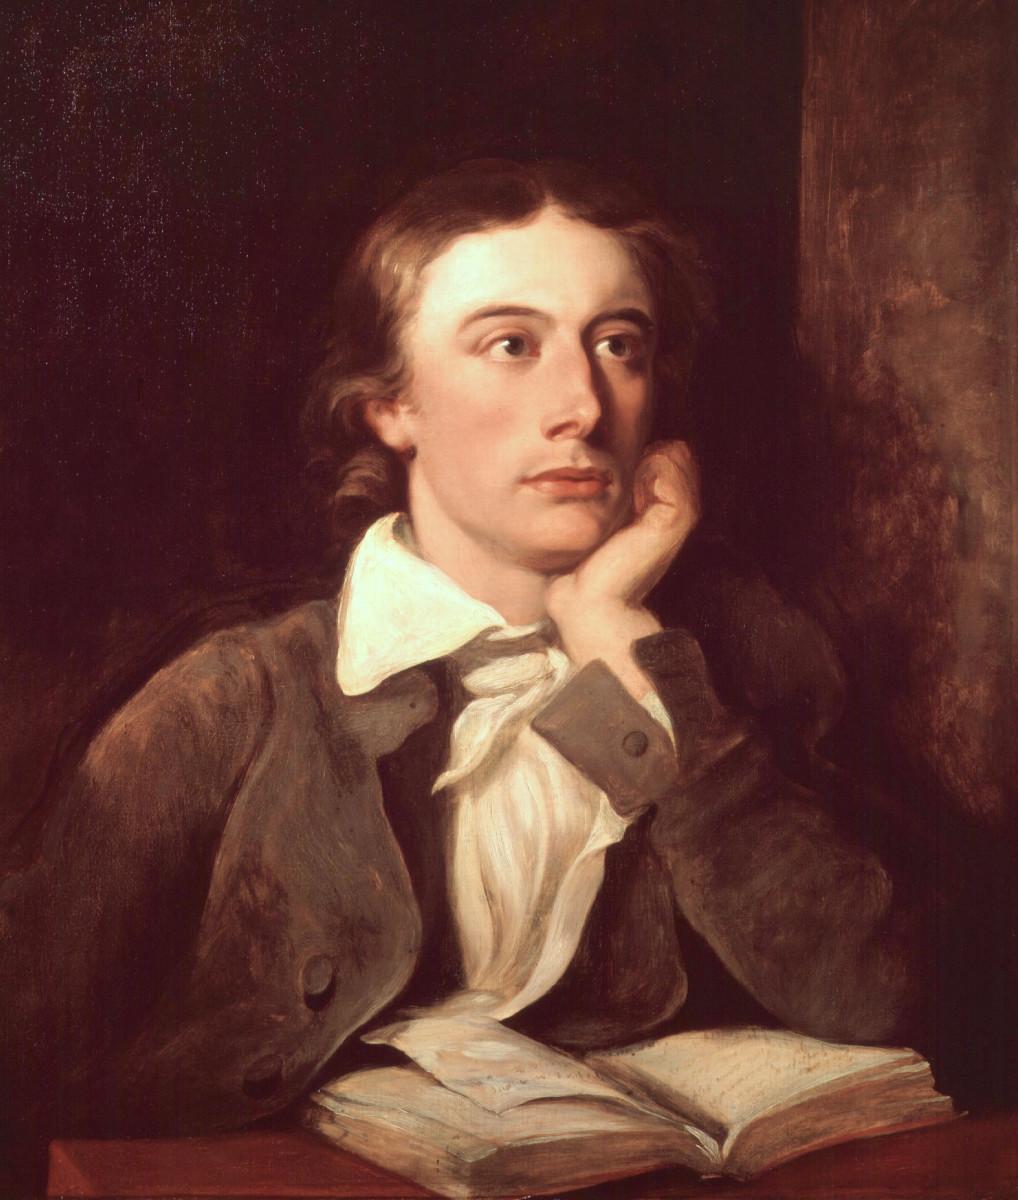 John Keats by William Hilton National Portrait Gallery